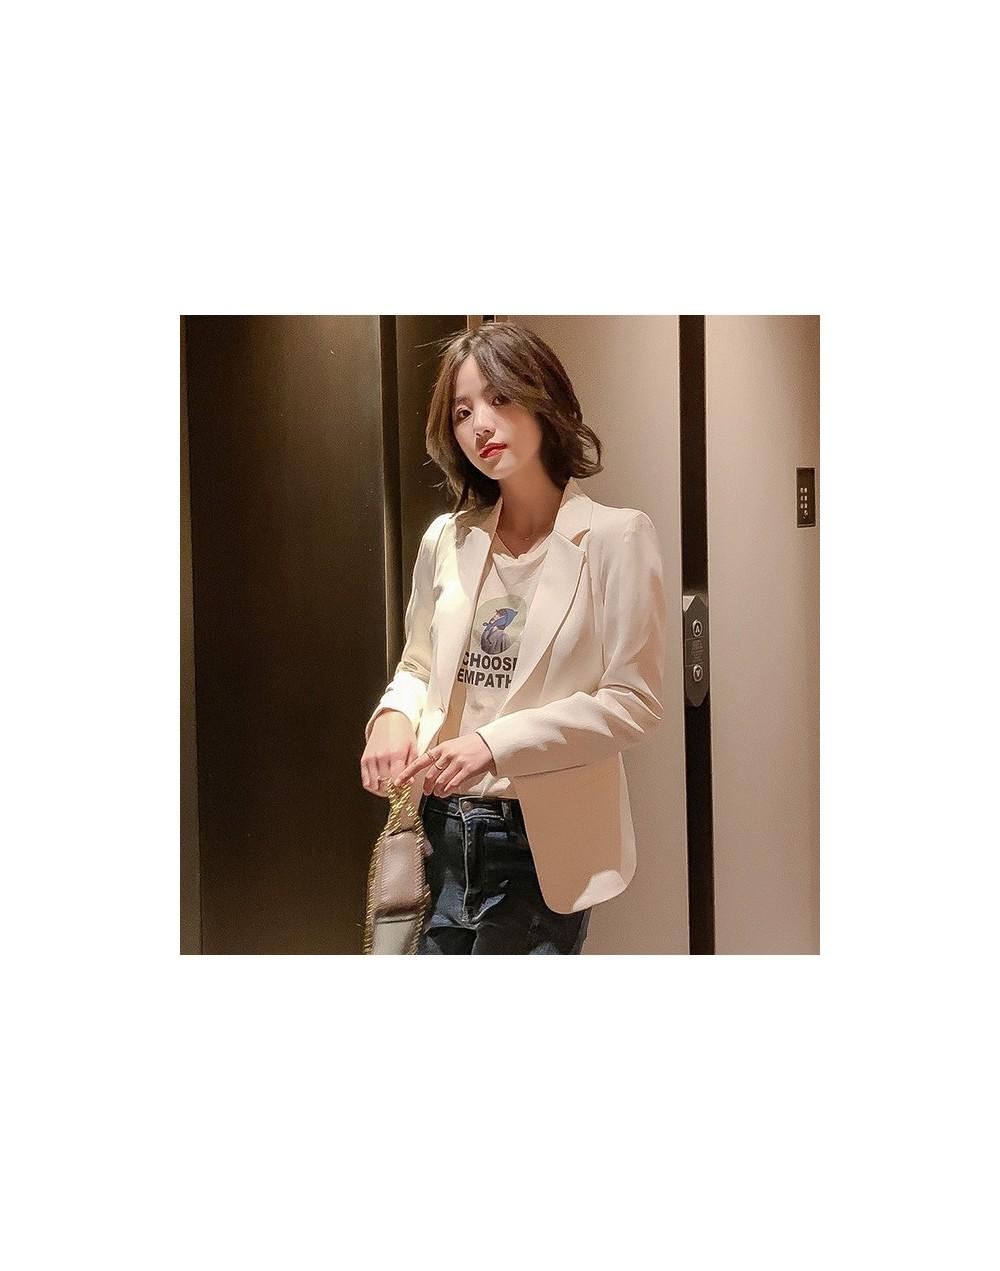 2019 autumn new Korean women's small suit jacket long-sleeved casual temperament wild short women's suit office jacket - F -...